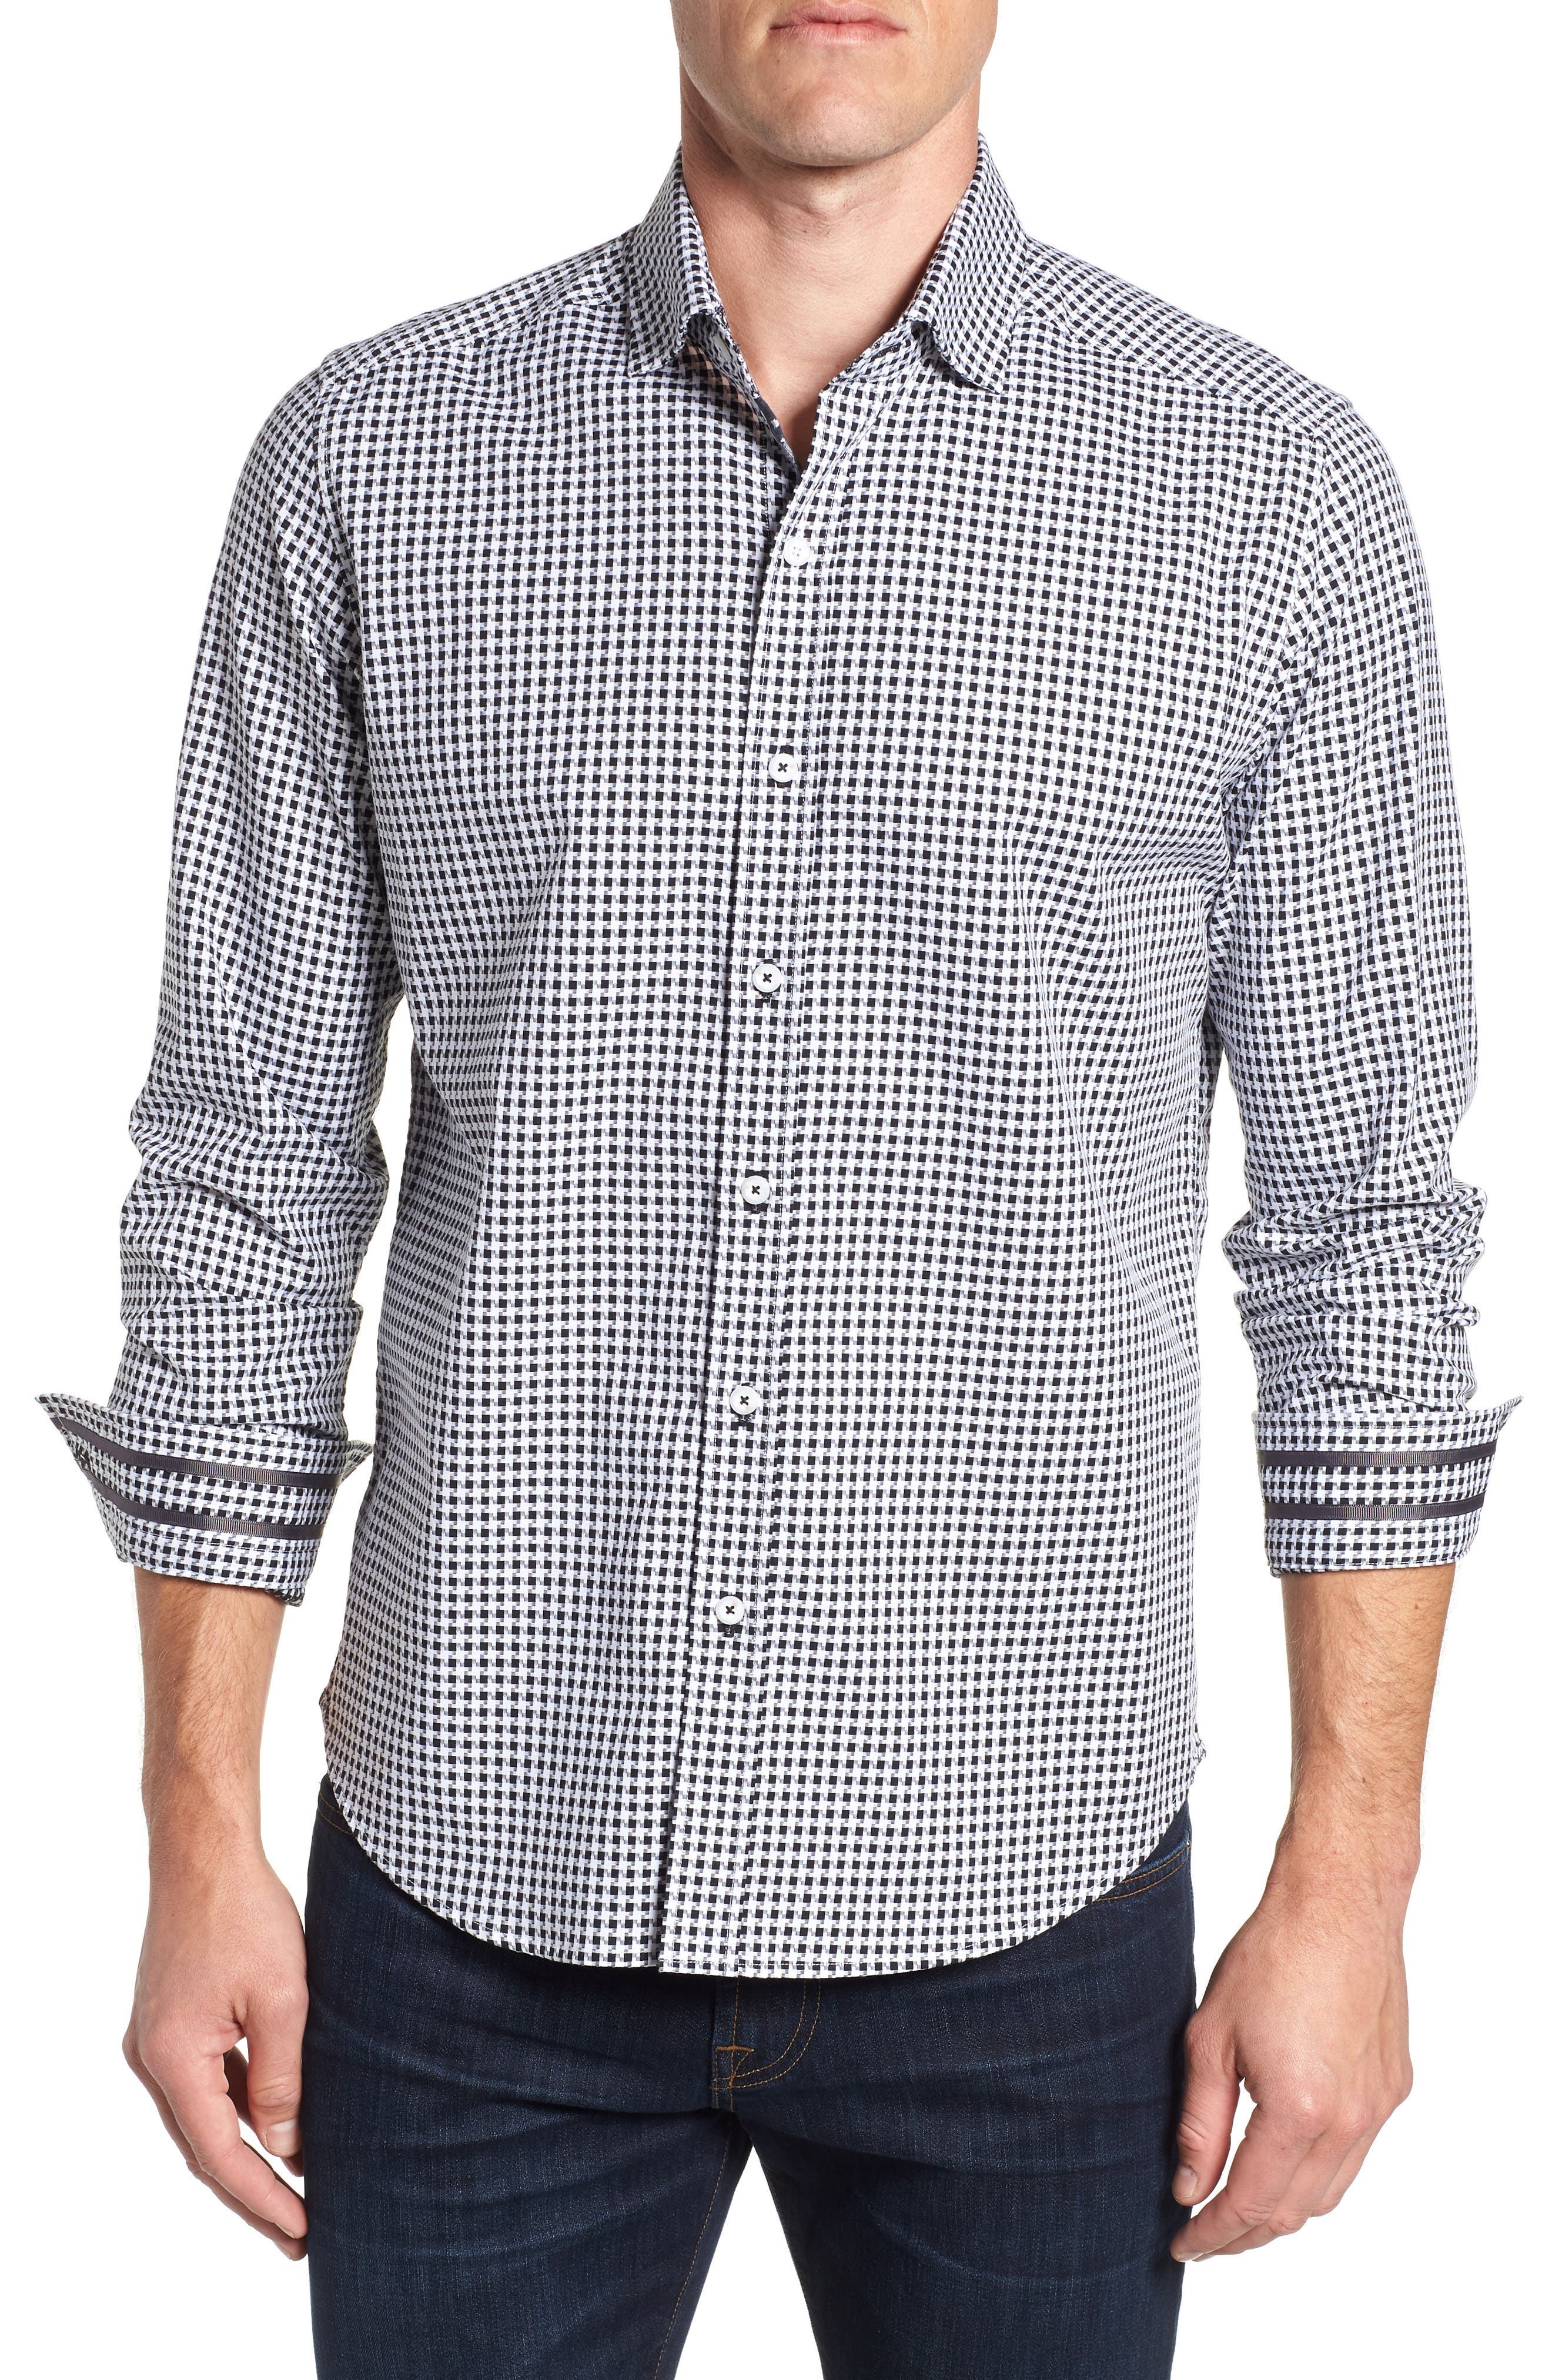 Emmett Tailored Fit Sport Shirt,                             Main thumbnail 1, color,                             BLACK